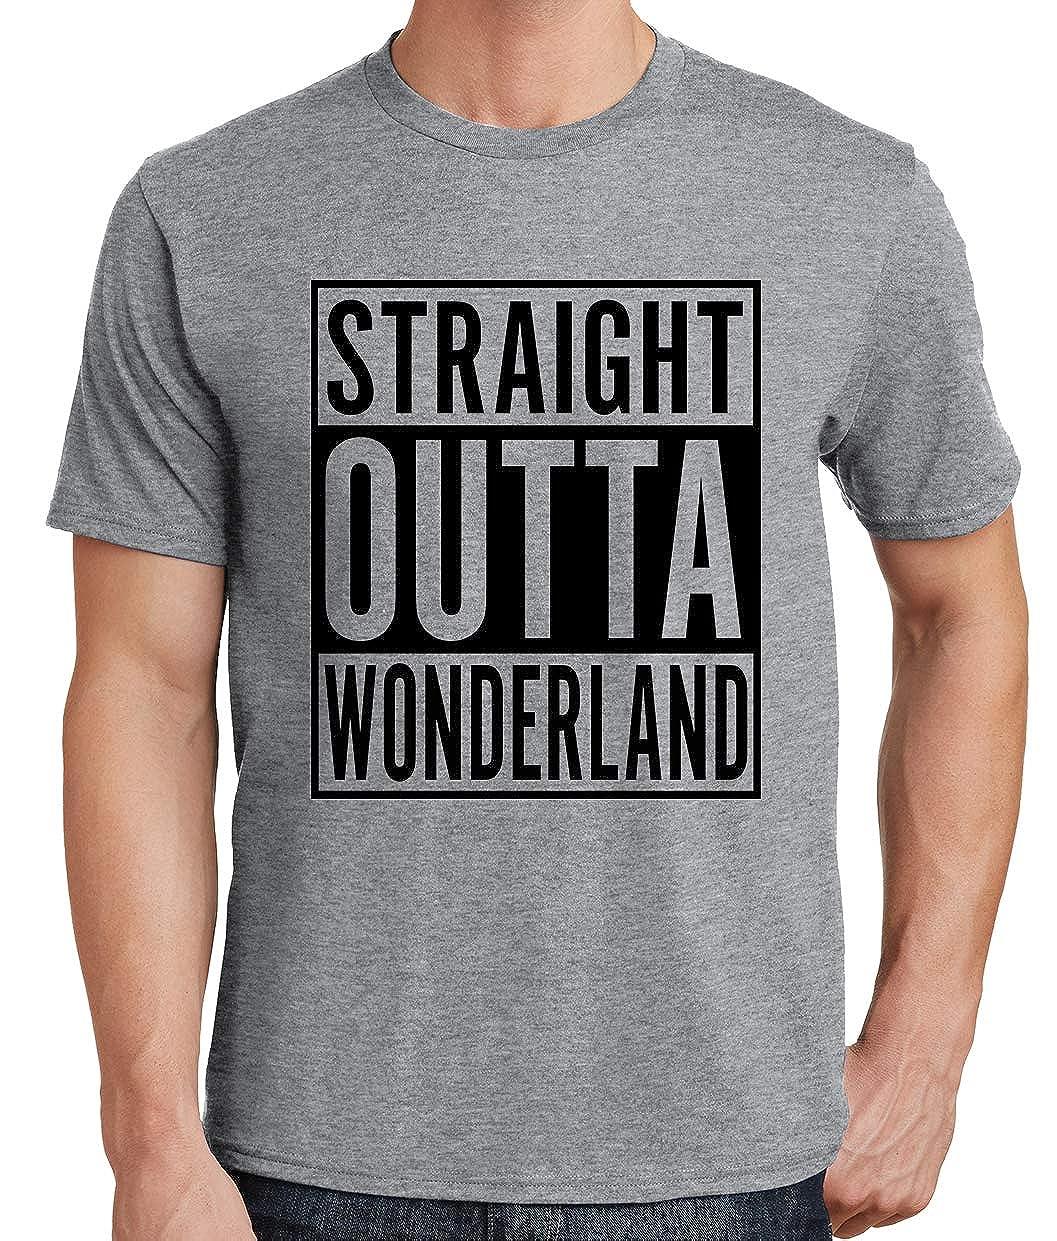 Tenacitee Mens Straight Outta Wonderland T-Shirt